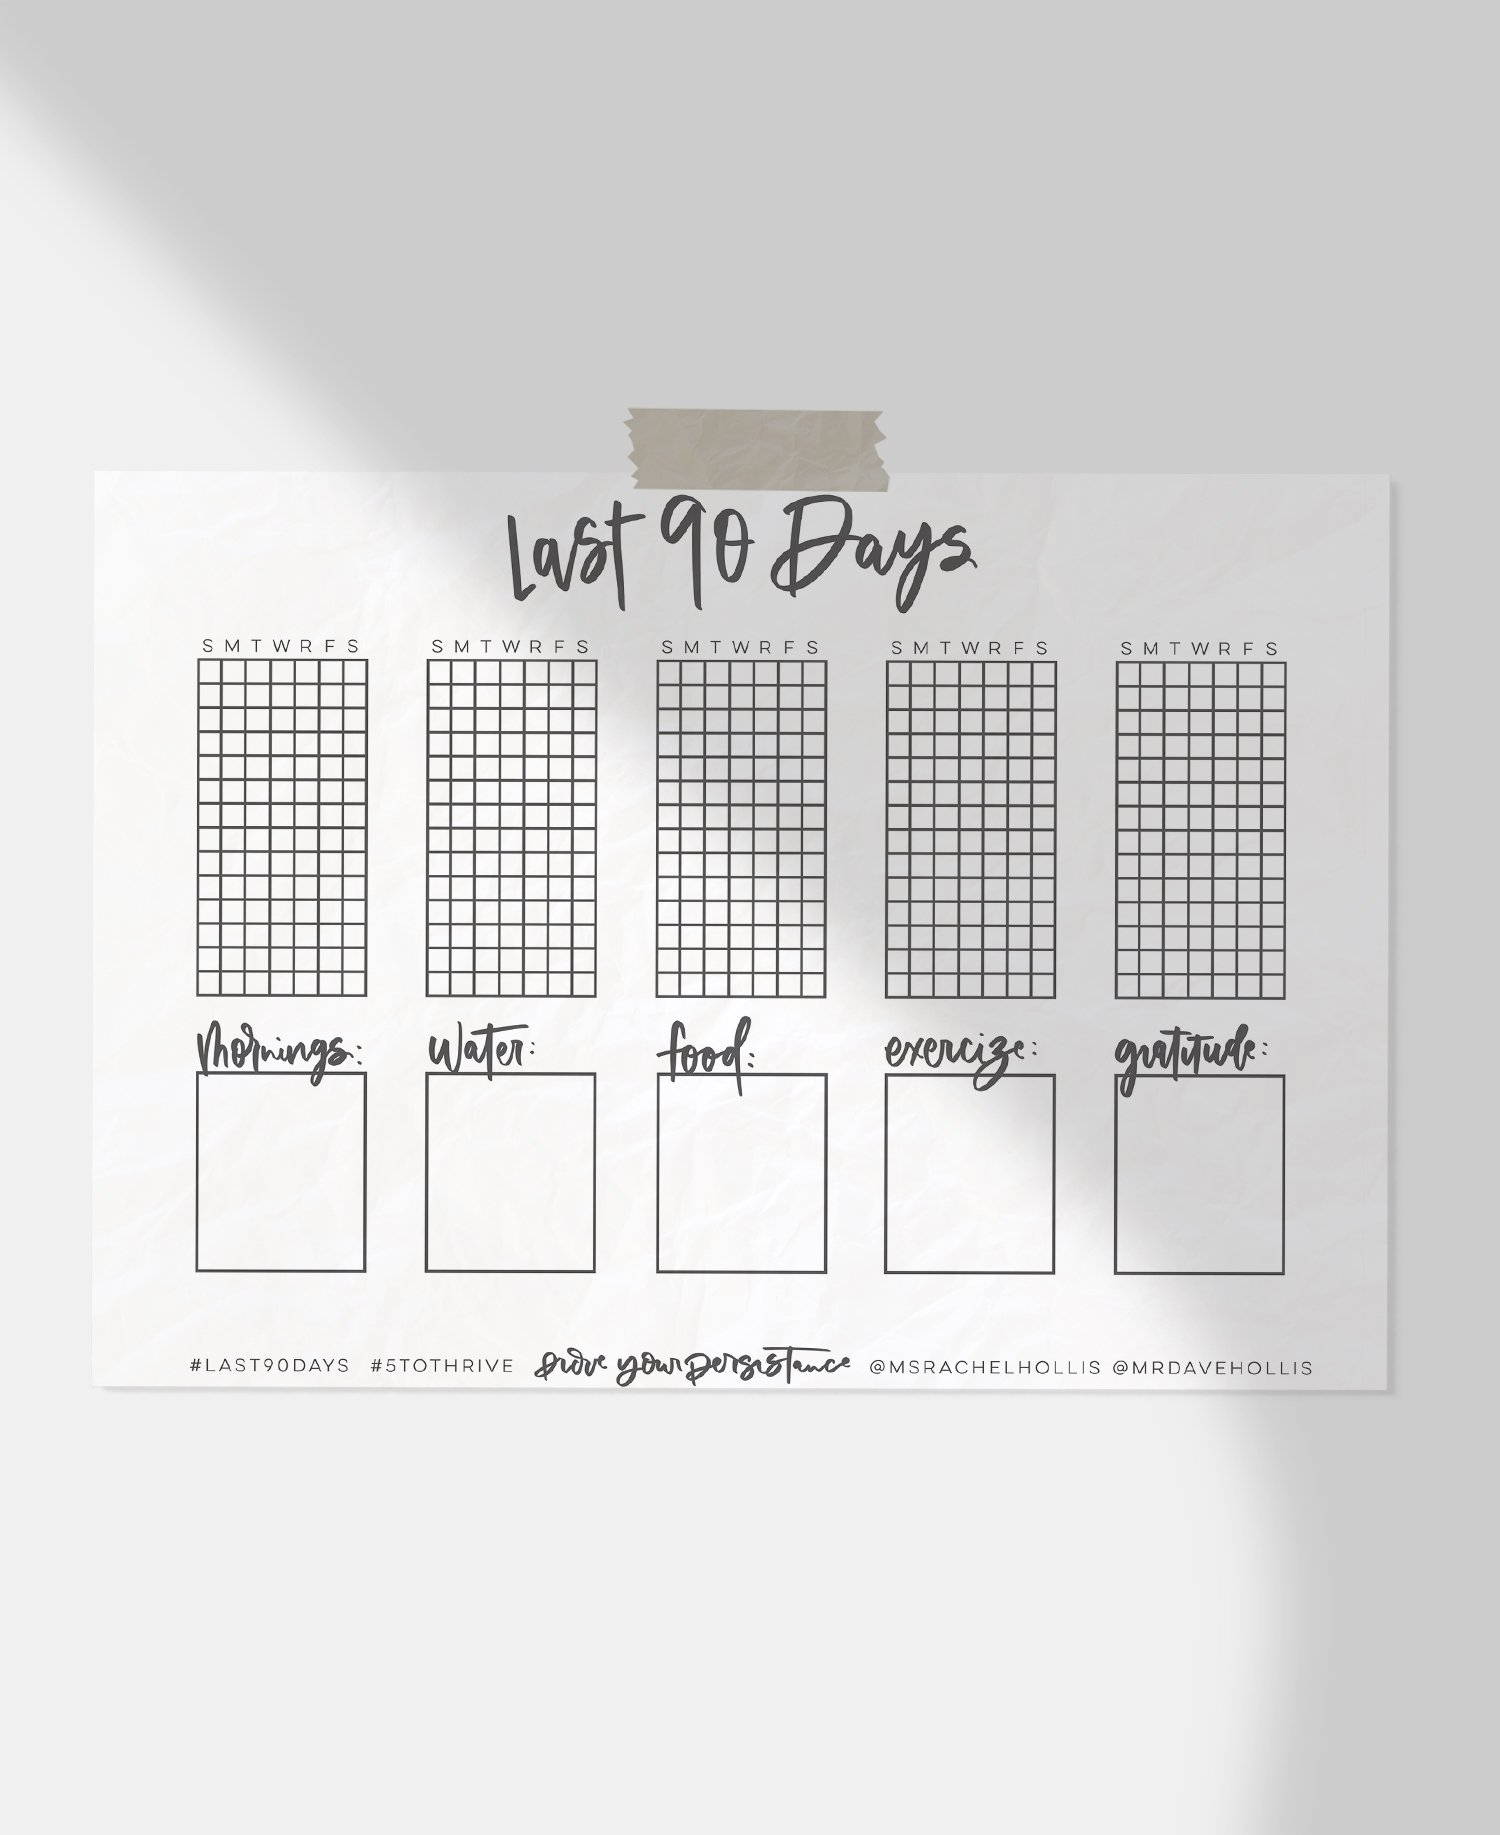 90 Day Calendar Printable   Calendar Template 2020 90 Day Meds Calendar